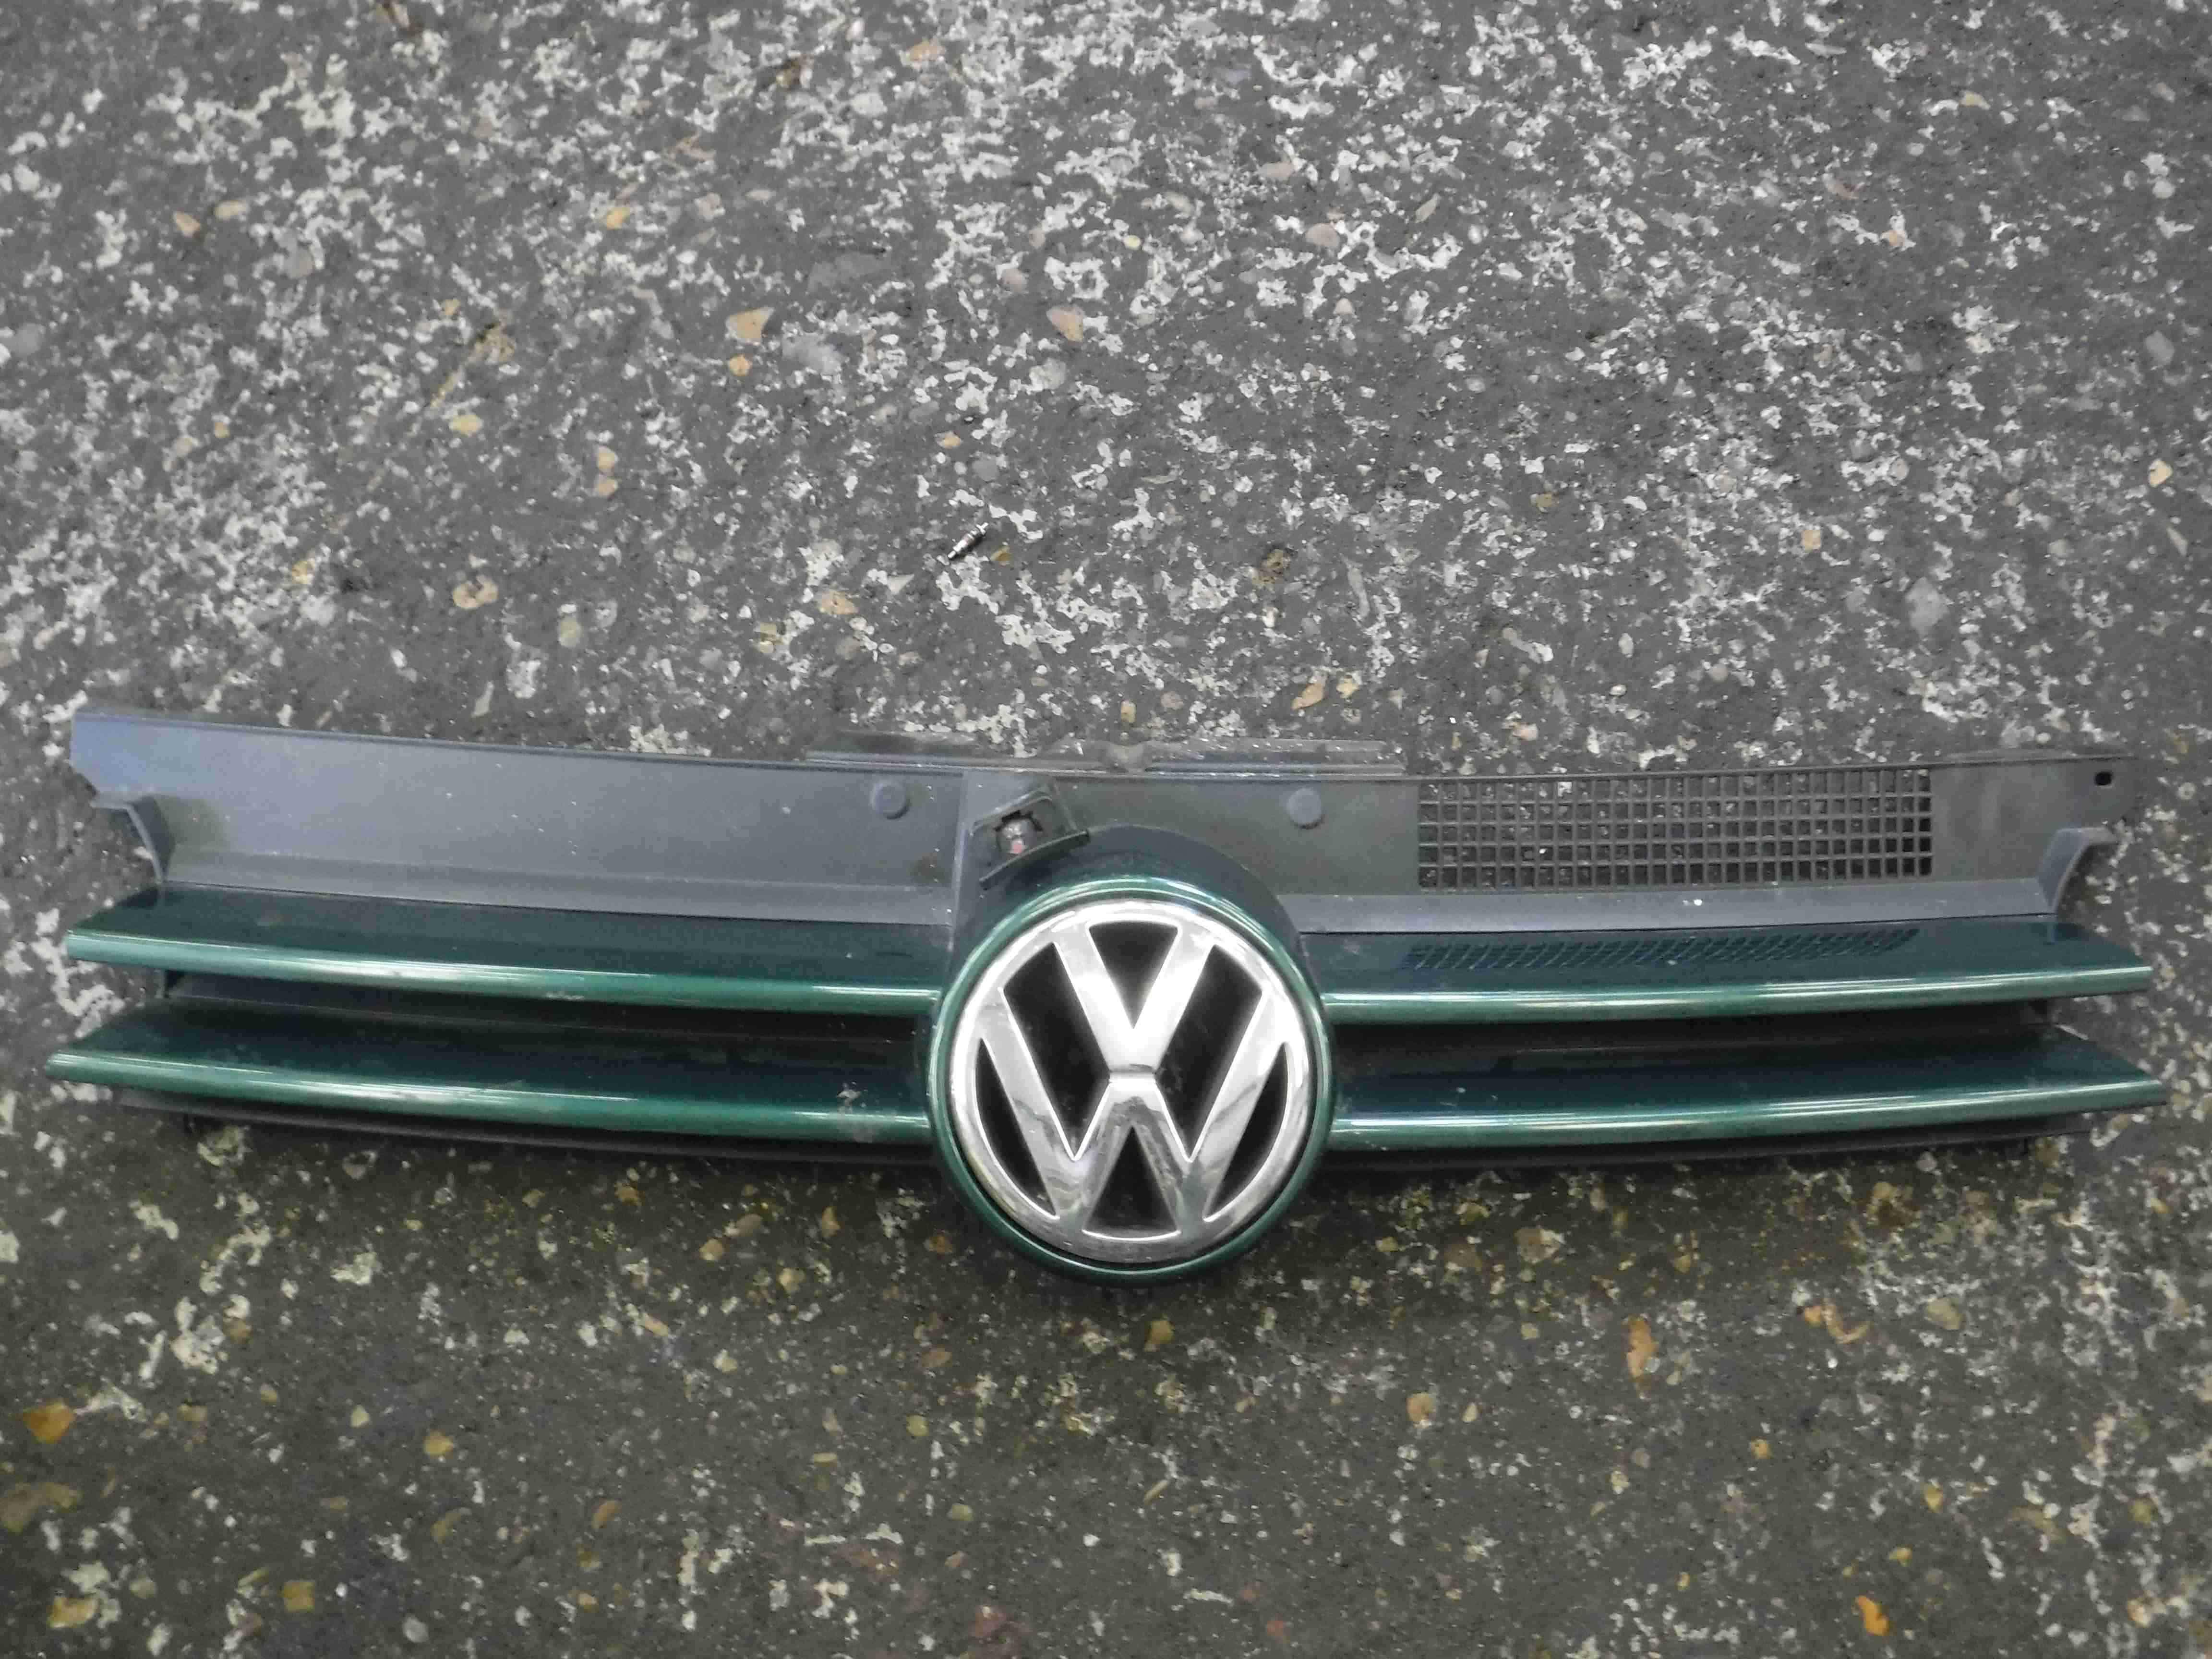 Volkswagen Golf MK4 1997-2004 Front Bumper Grill Grille Green LC6M